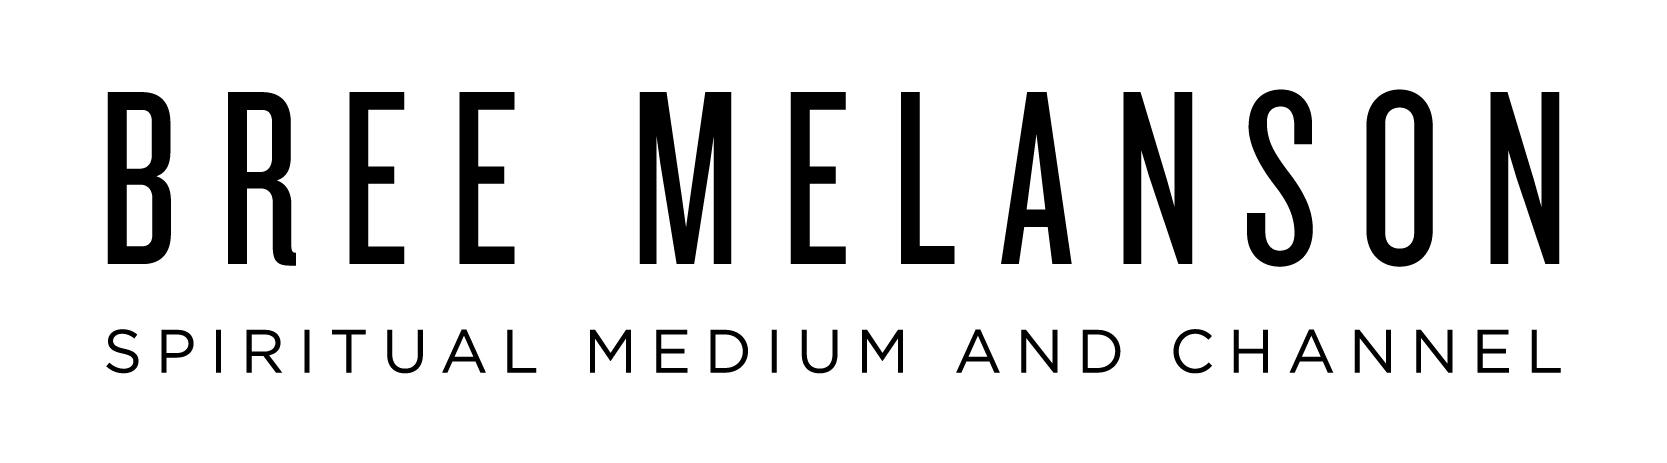 Bree_Melanson-Logo.jpg